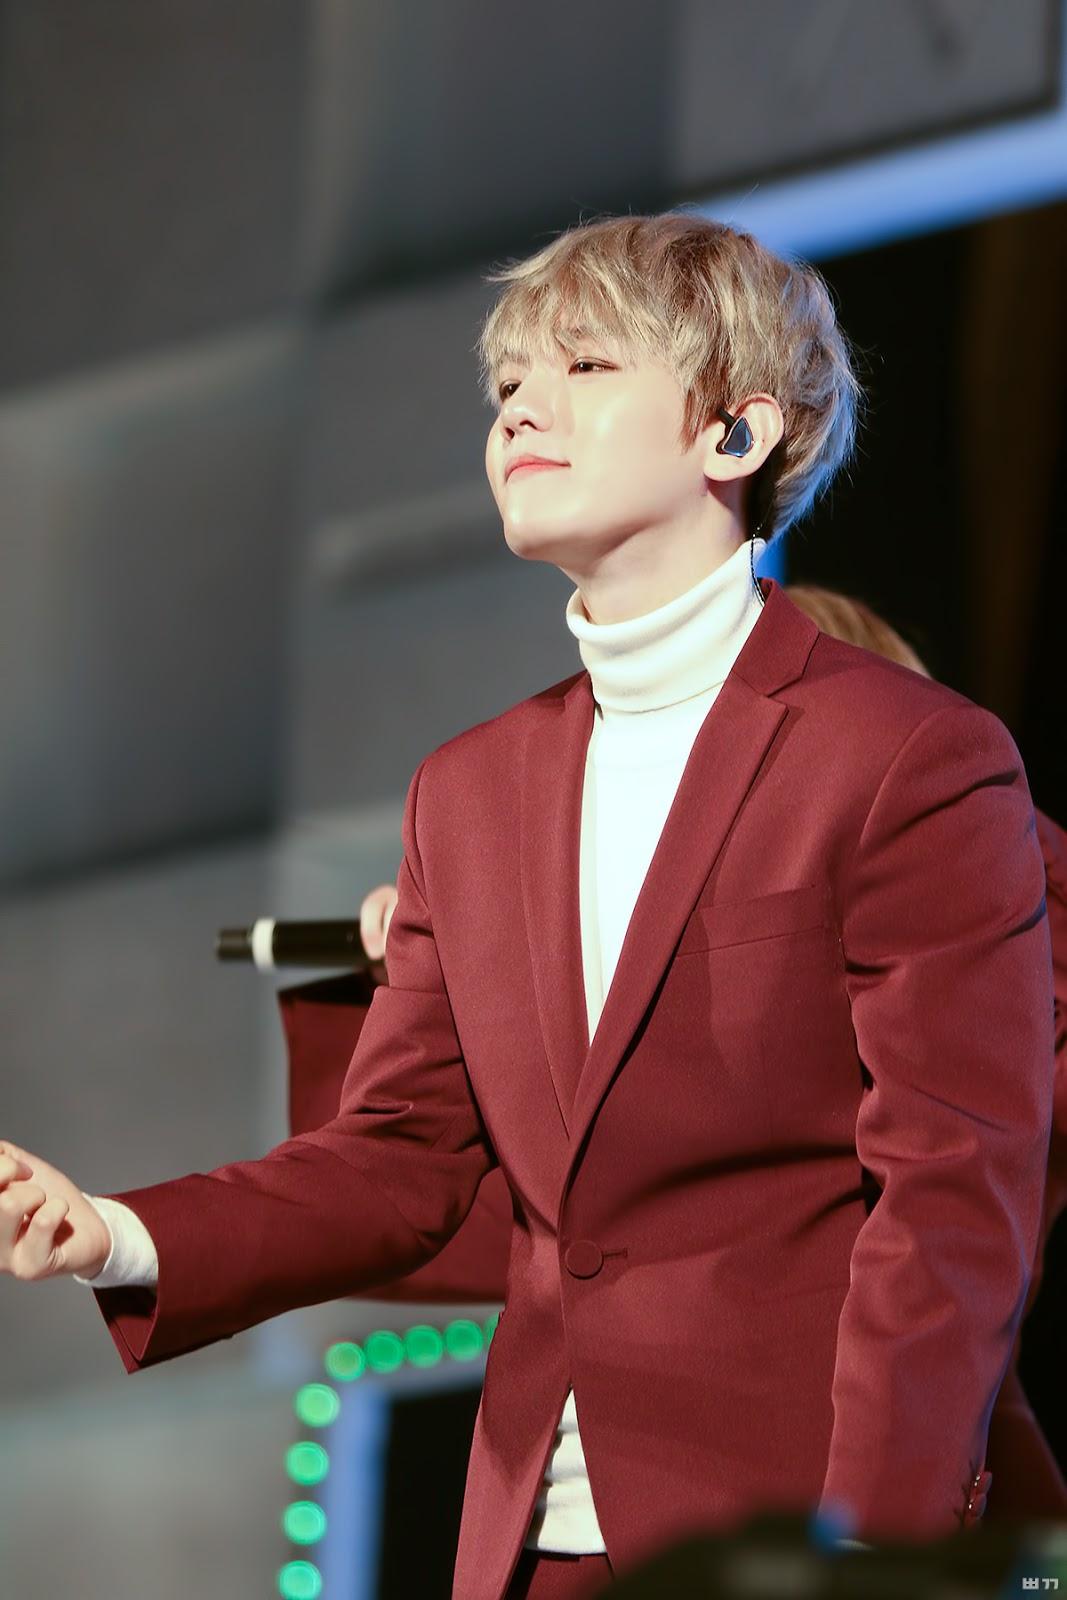 Sehun Exo >> Photo )) EXO Baekhyun With Red And Pink • Kpopmap